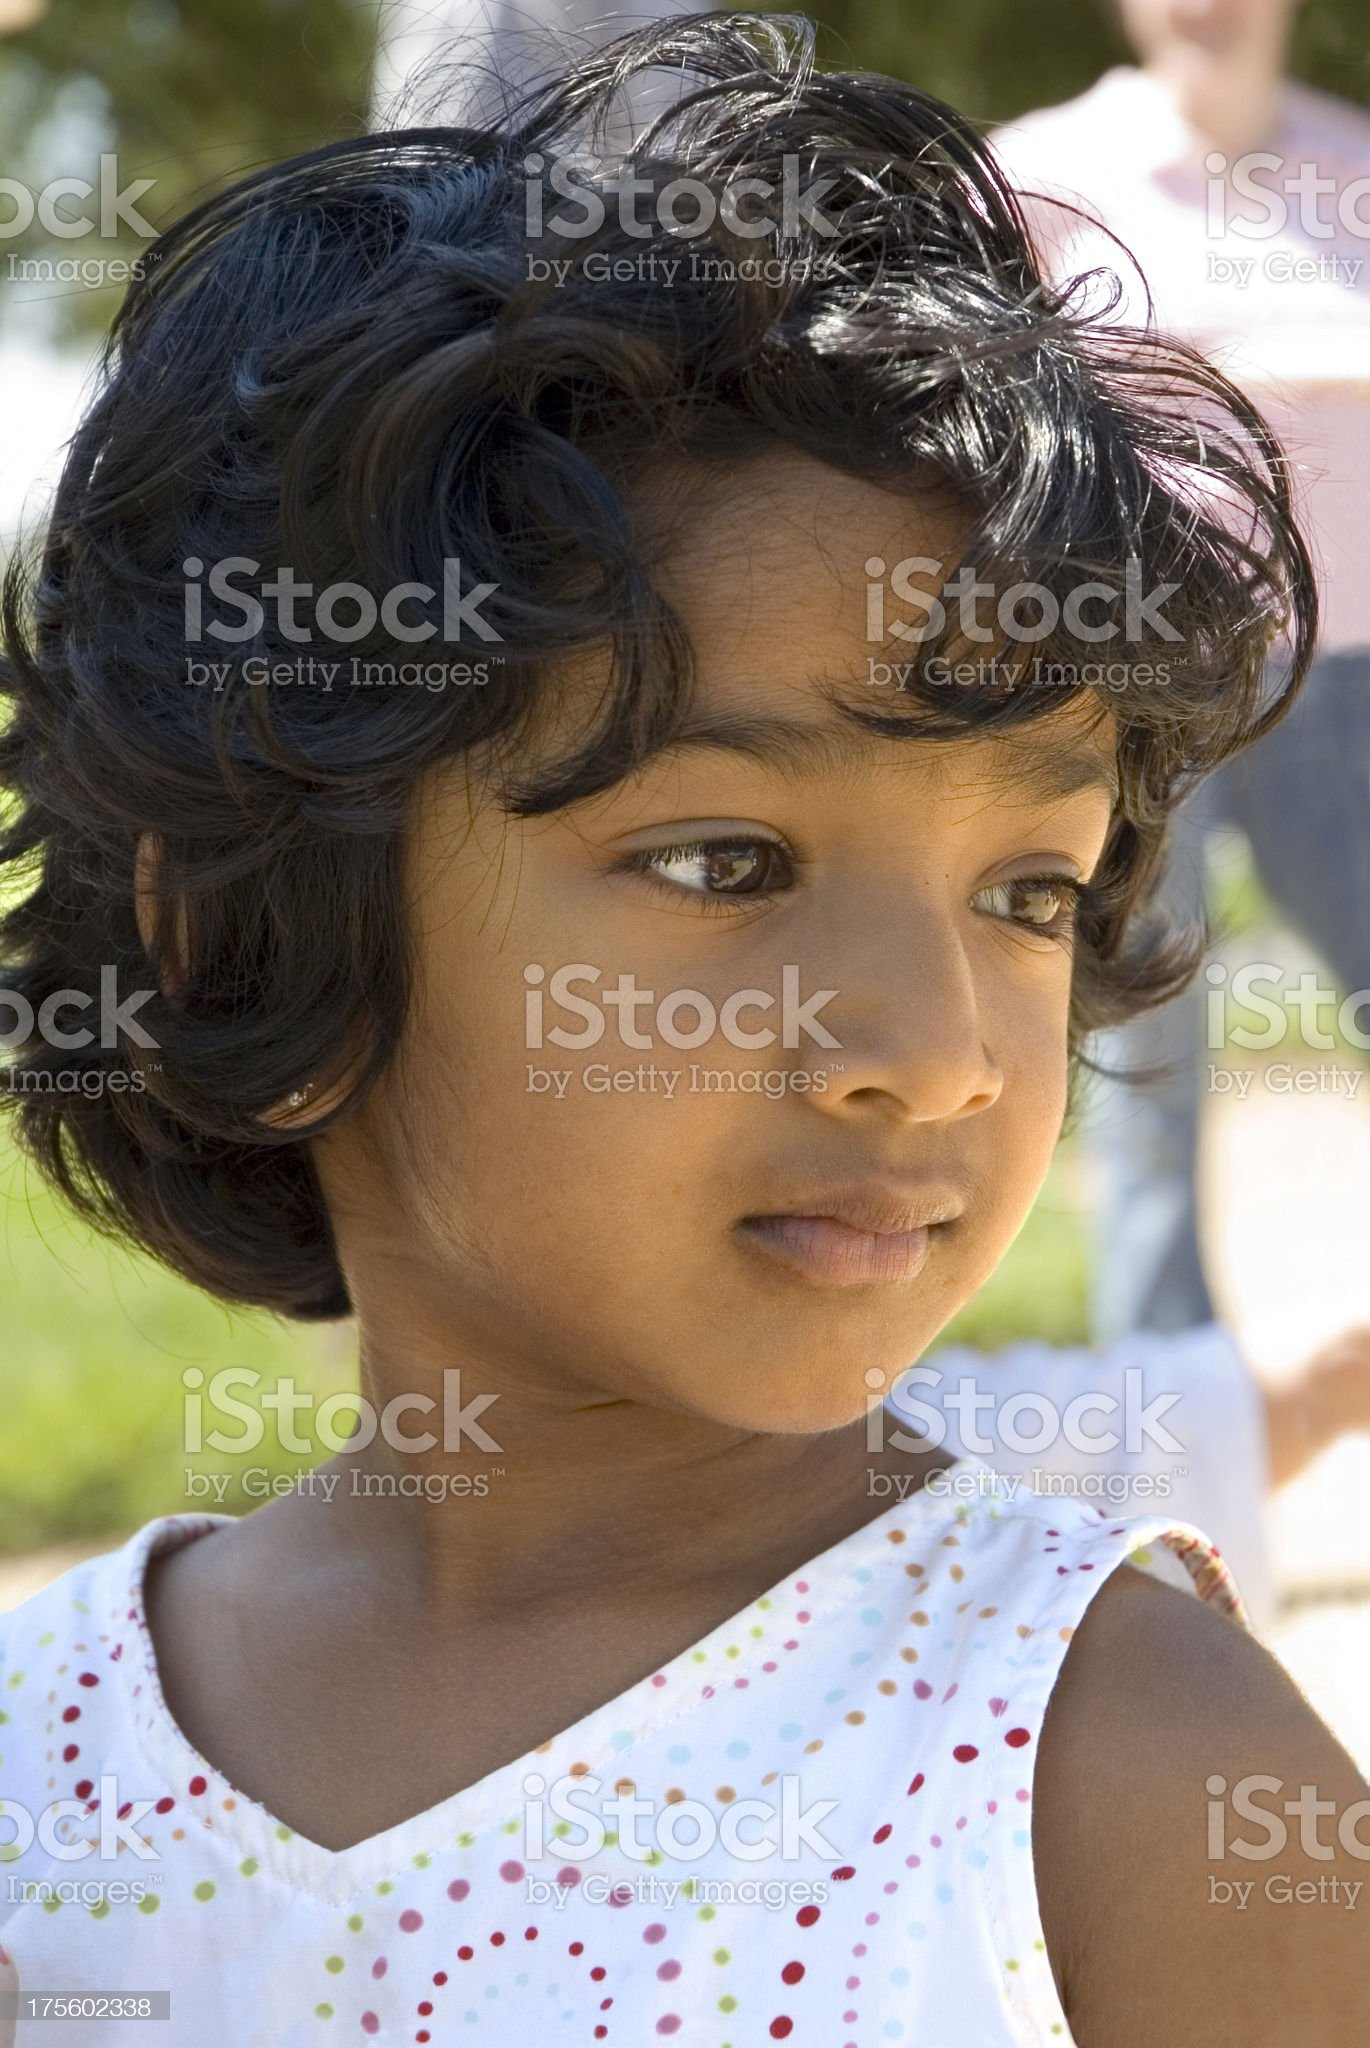 Beatiful Little Indian Girl royalty-free stock photo